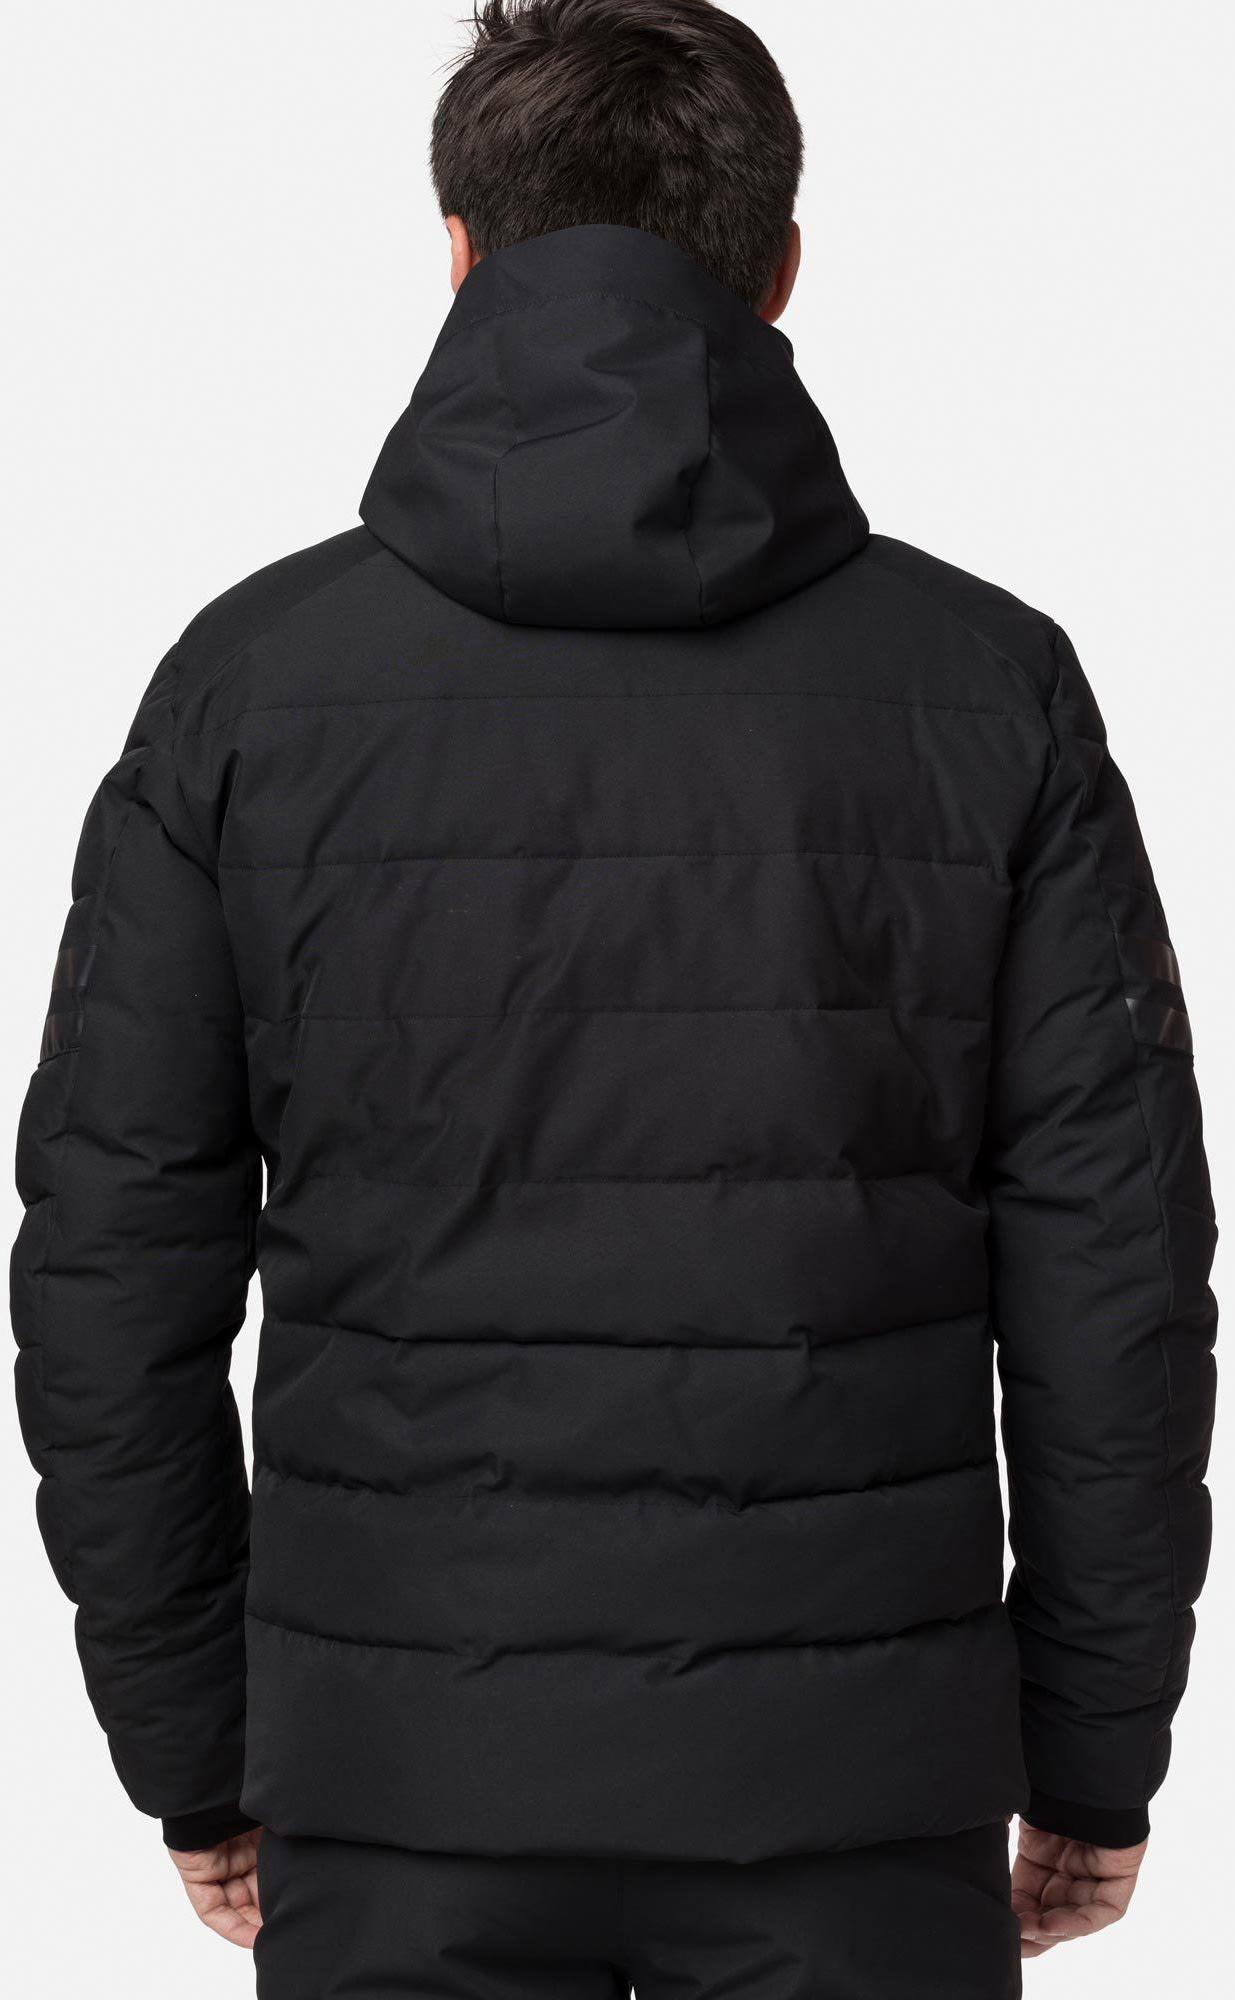 10cda60f5d76 Rossignol Rapide Ski Jacket - thumbnail 3